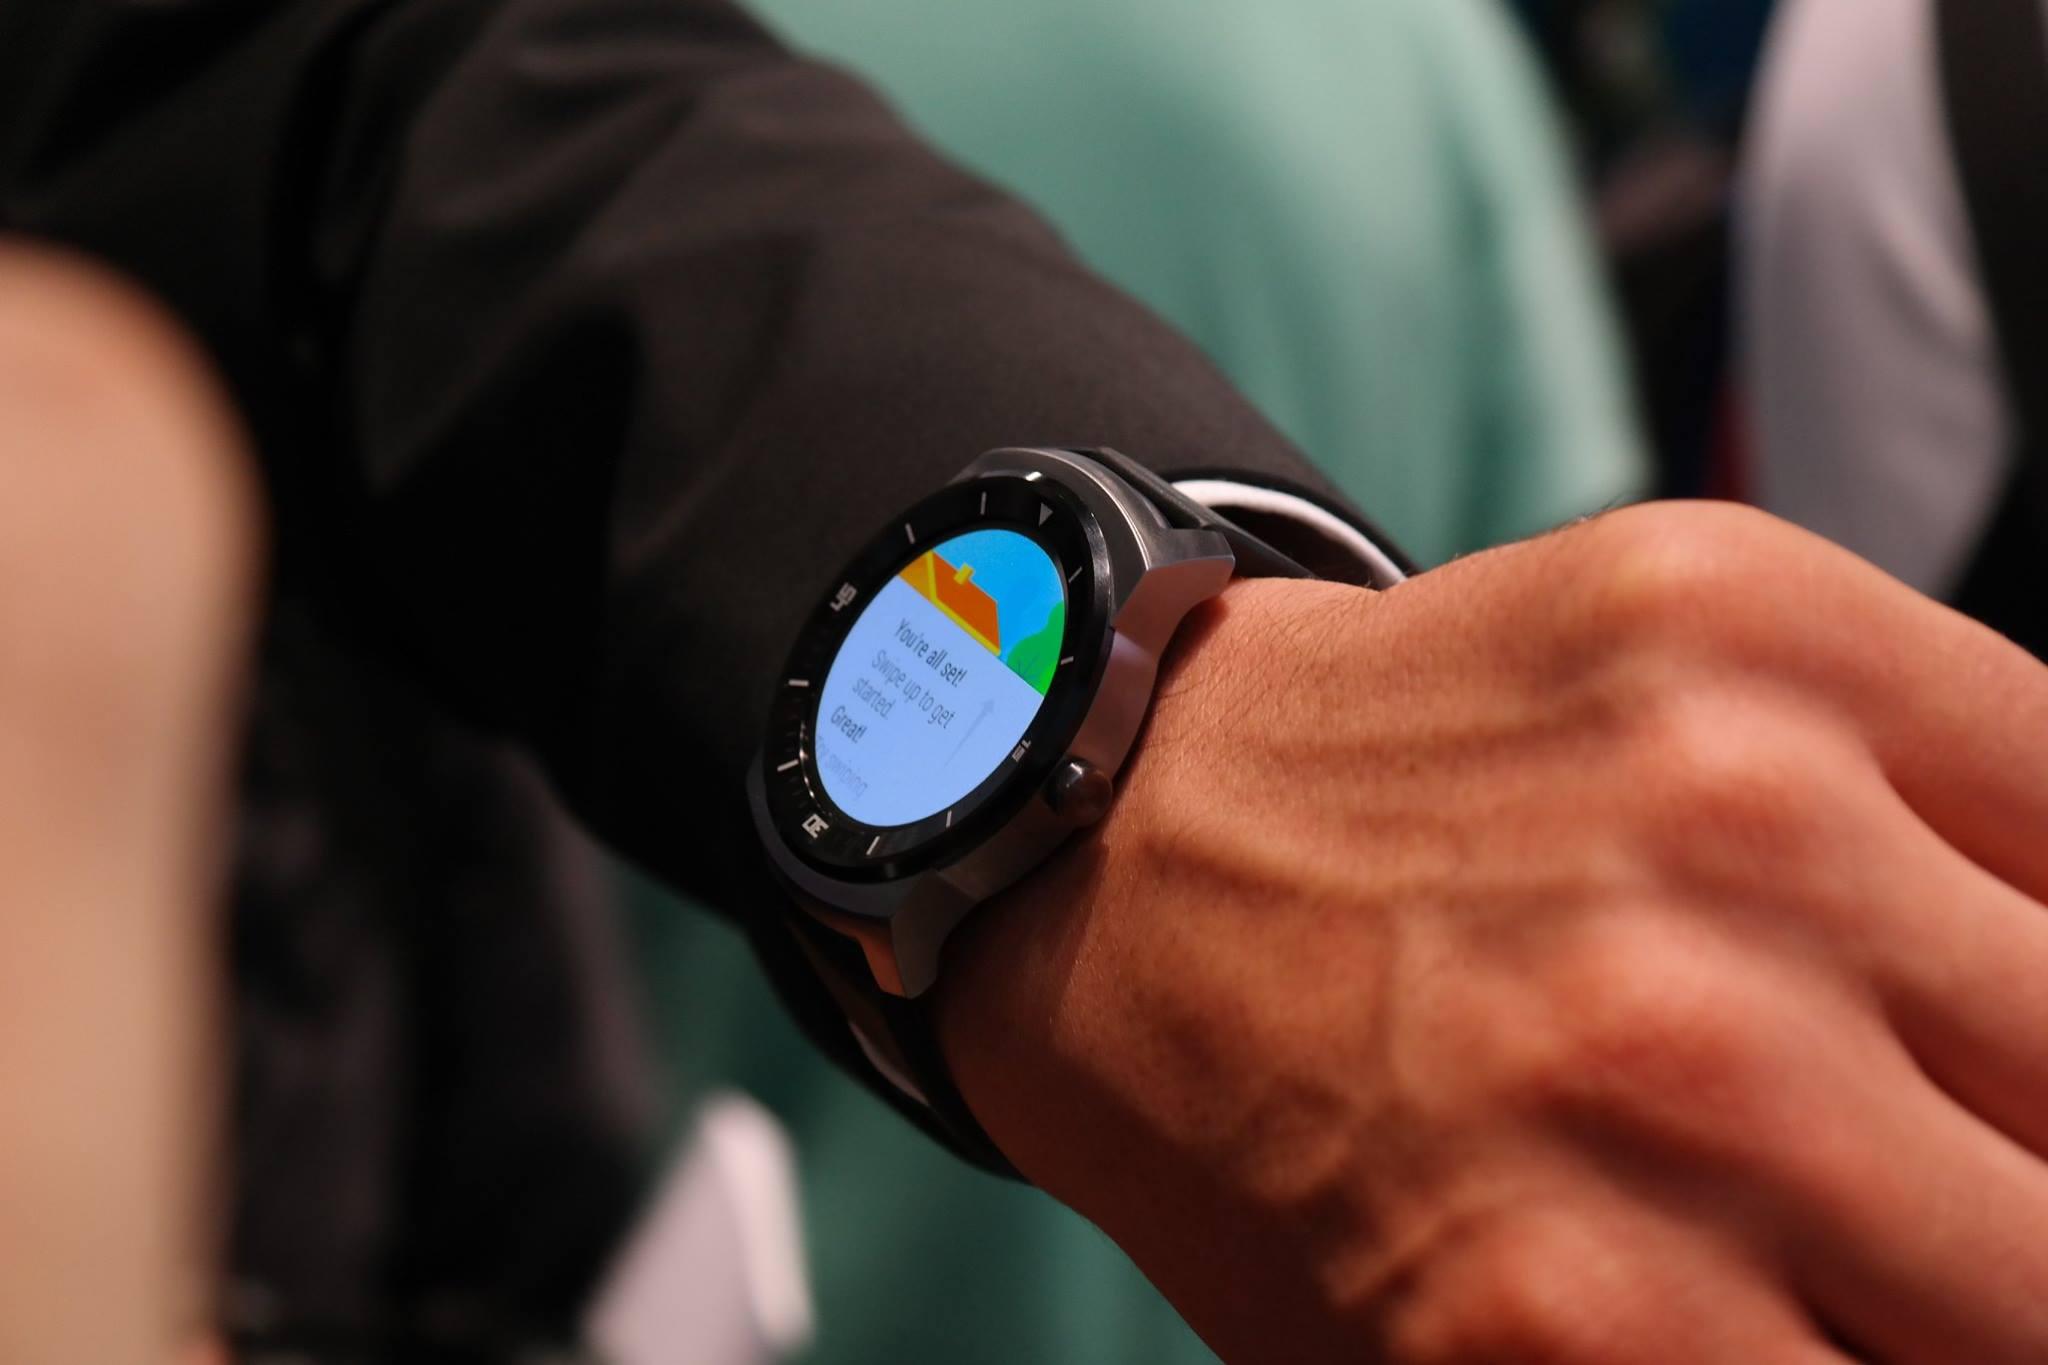 Am testat LG G Watch R, poate cel mai bun smartwatch din 2014 [VIDEO Hands-on]